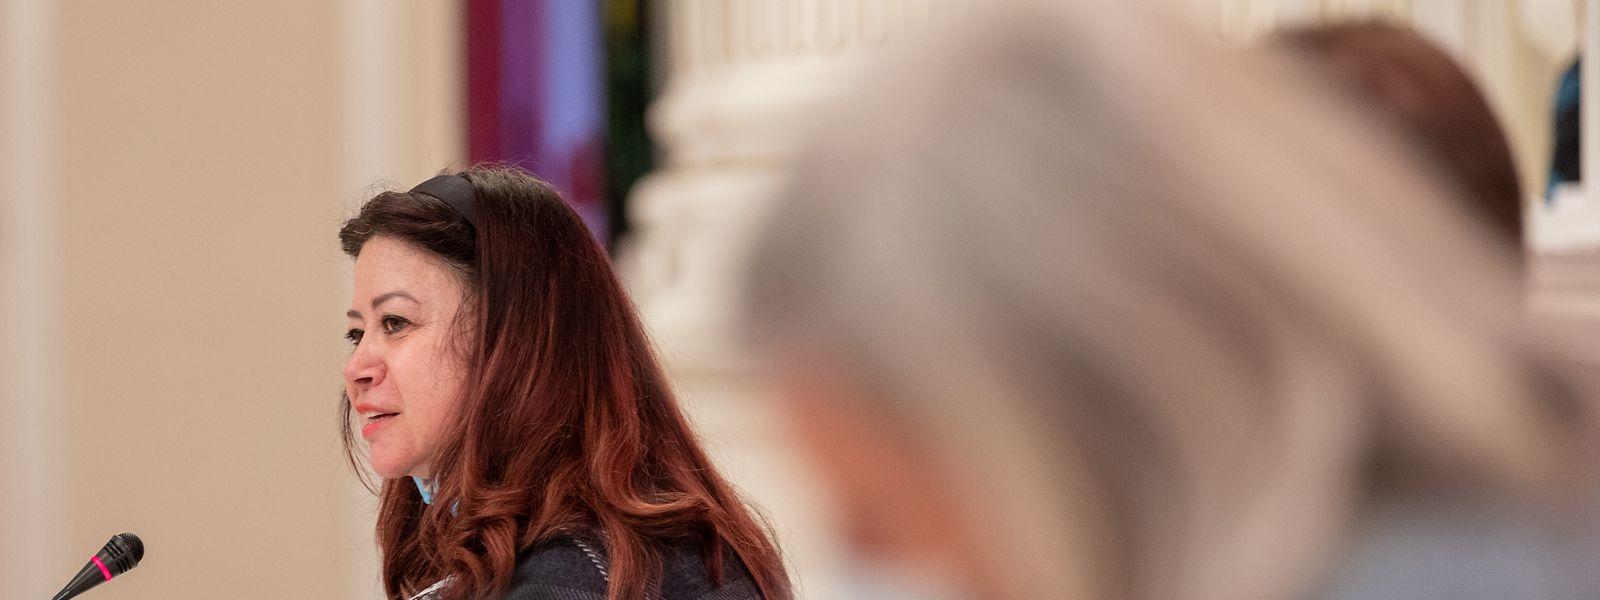 Claudia Monti ist seit März 2017 Ombudsman.